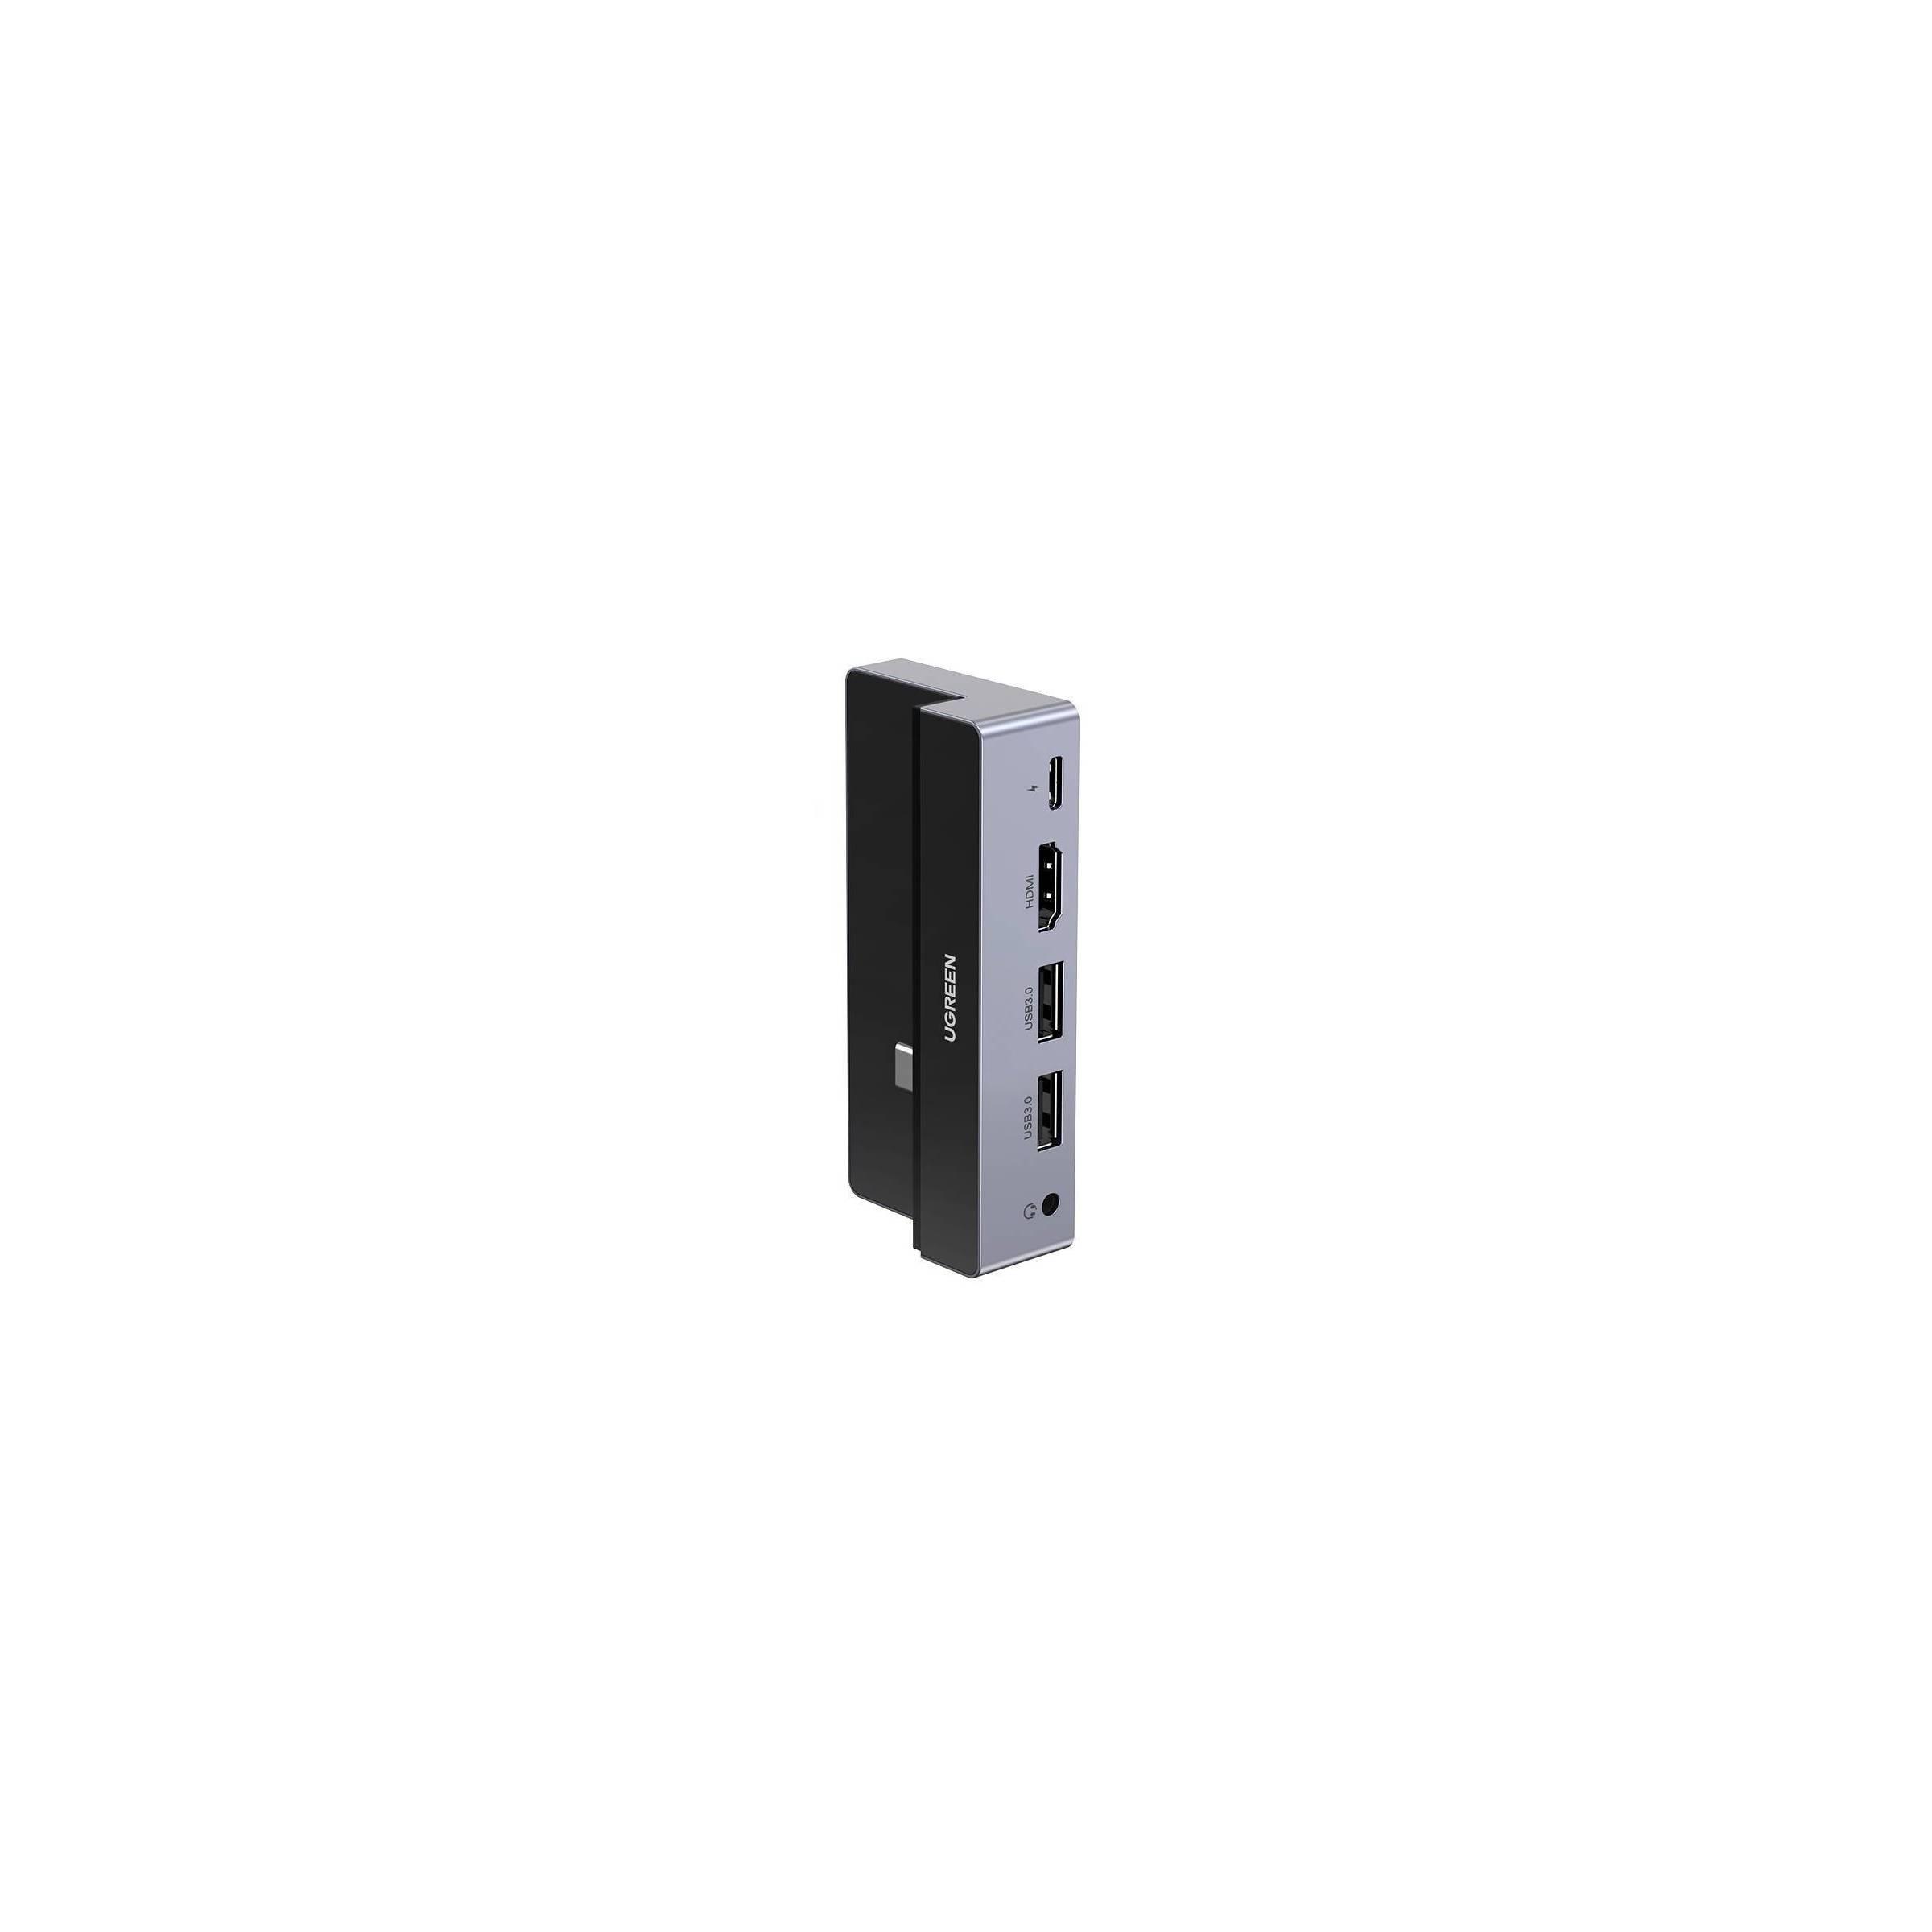 ugreen – Ugreen 5 in 1 ipad usb-c dock hdmi, usb, mini jack fra mackabler.dk